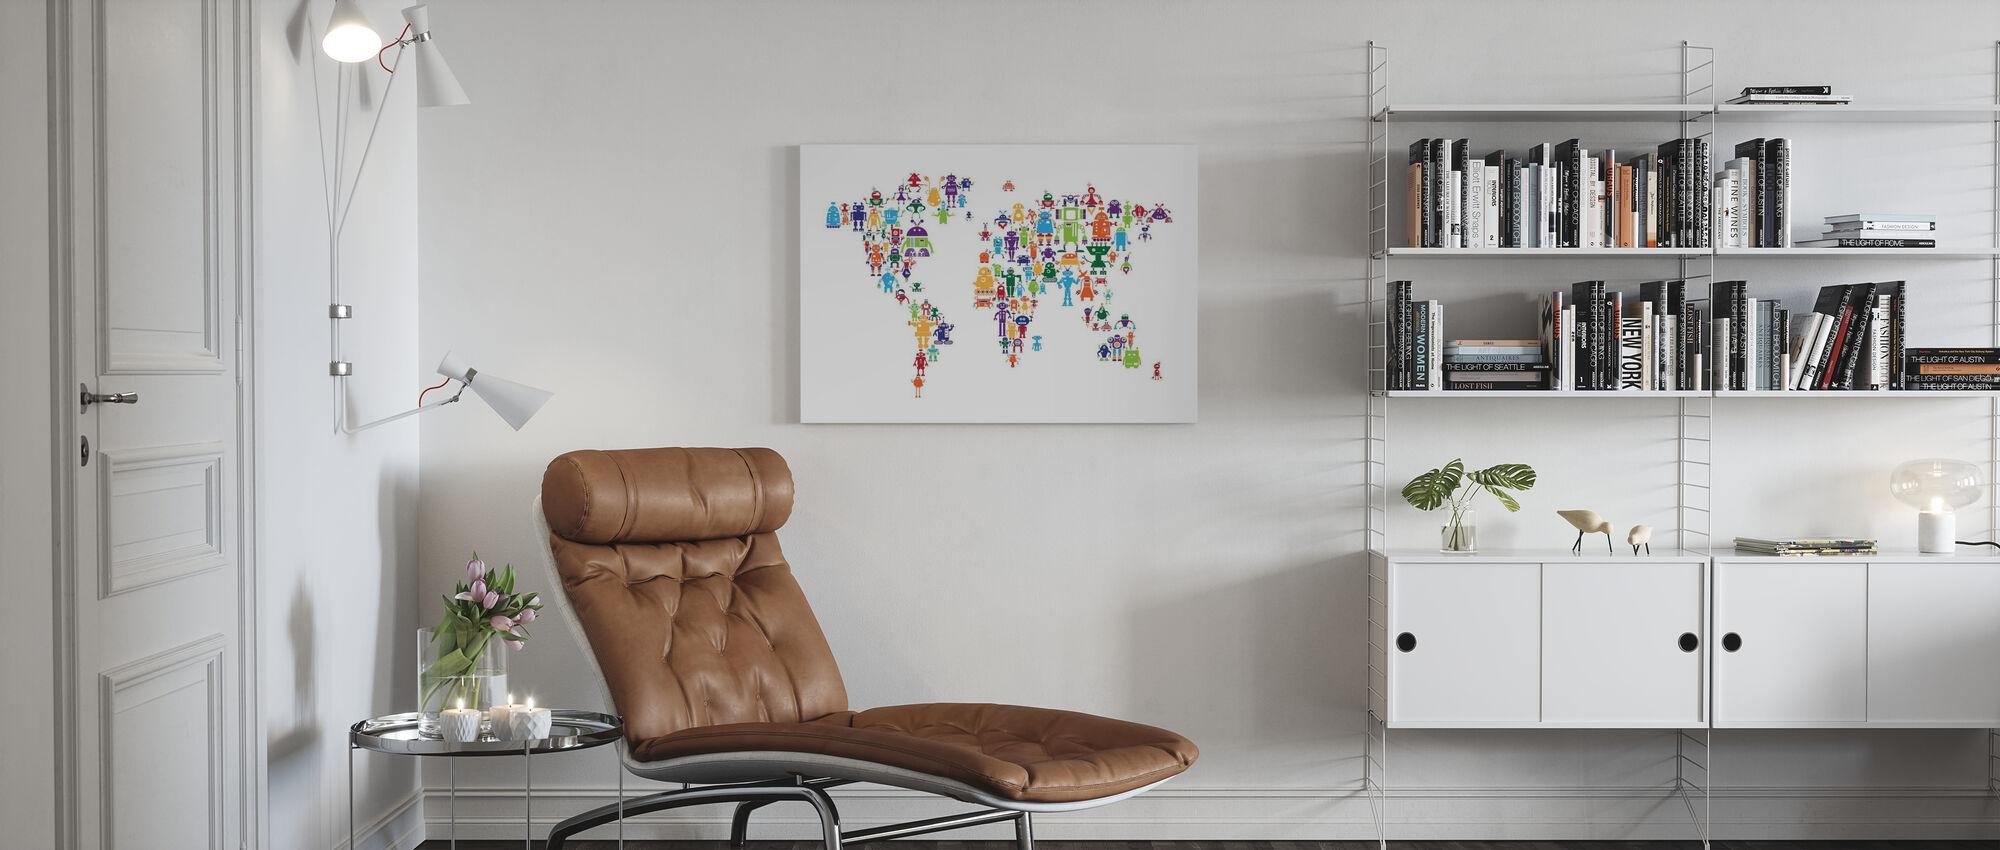 Robotar World Karta - Canvastavla - Vardagsrum